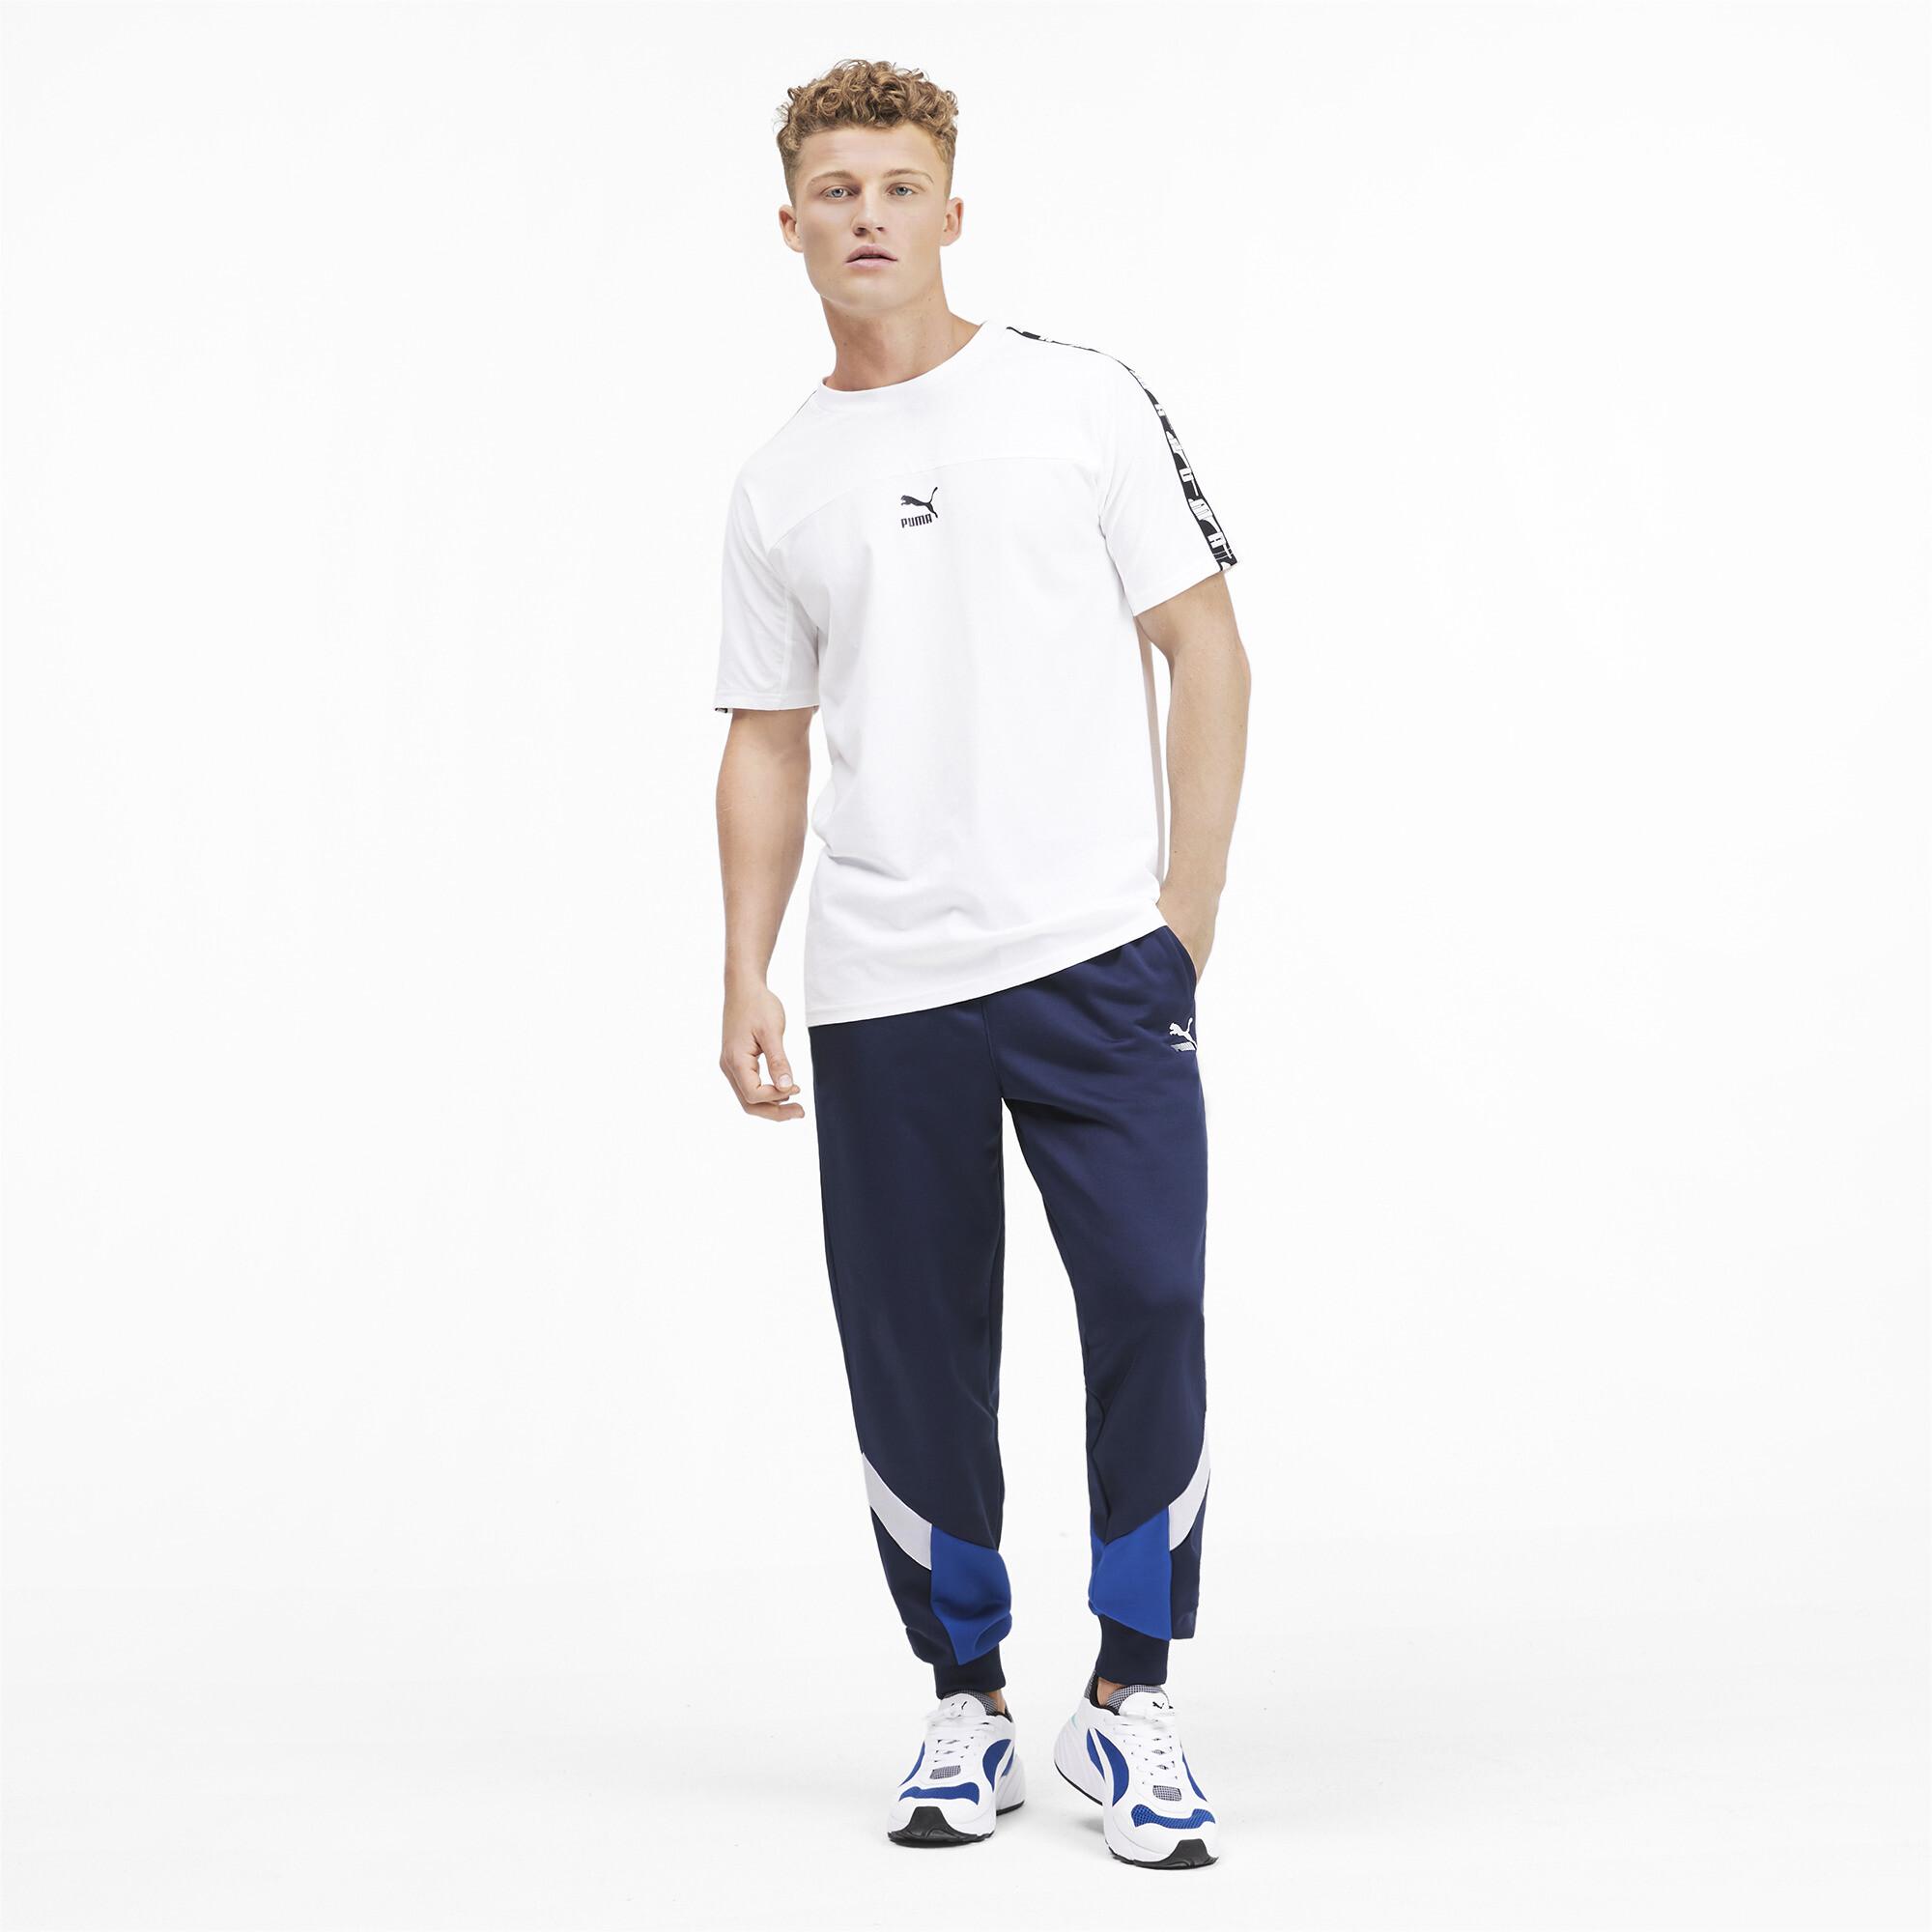 PUMA-Iconic-MCS-Men-039-s-Track-Pants-Men-Knitted-Pants-Sport-Classics thumbnail 22